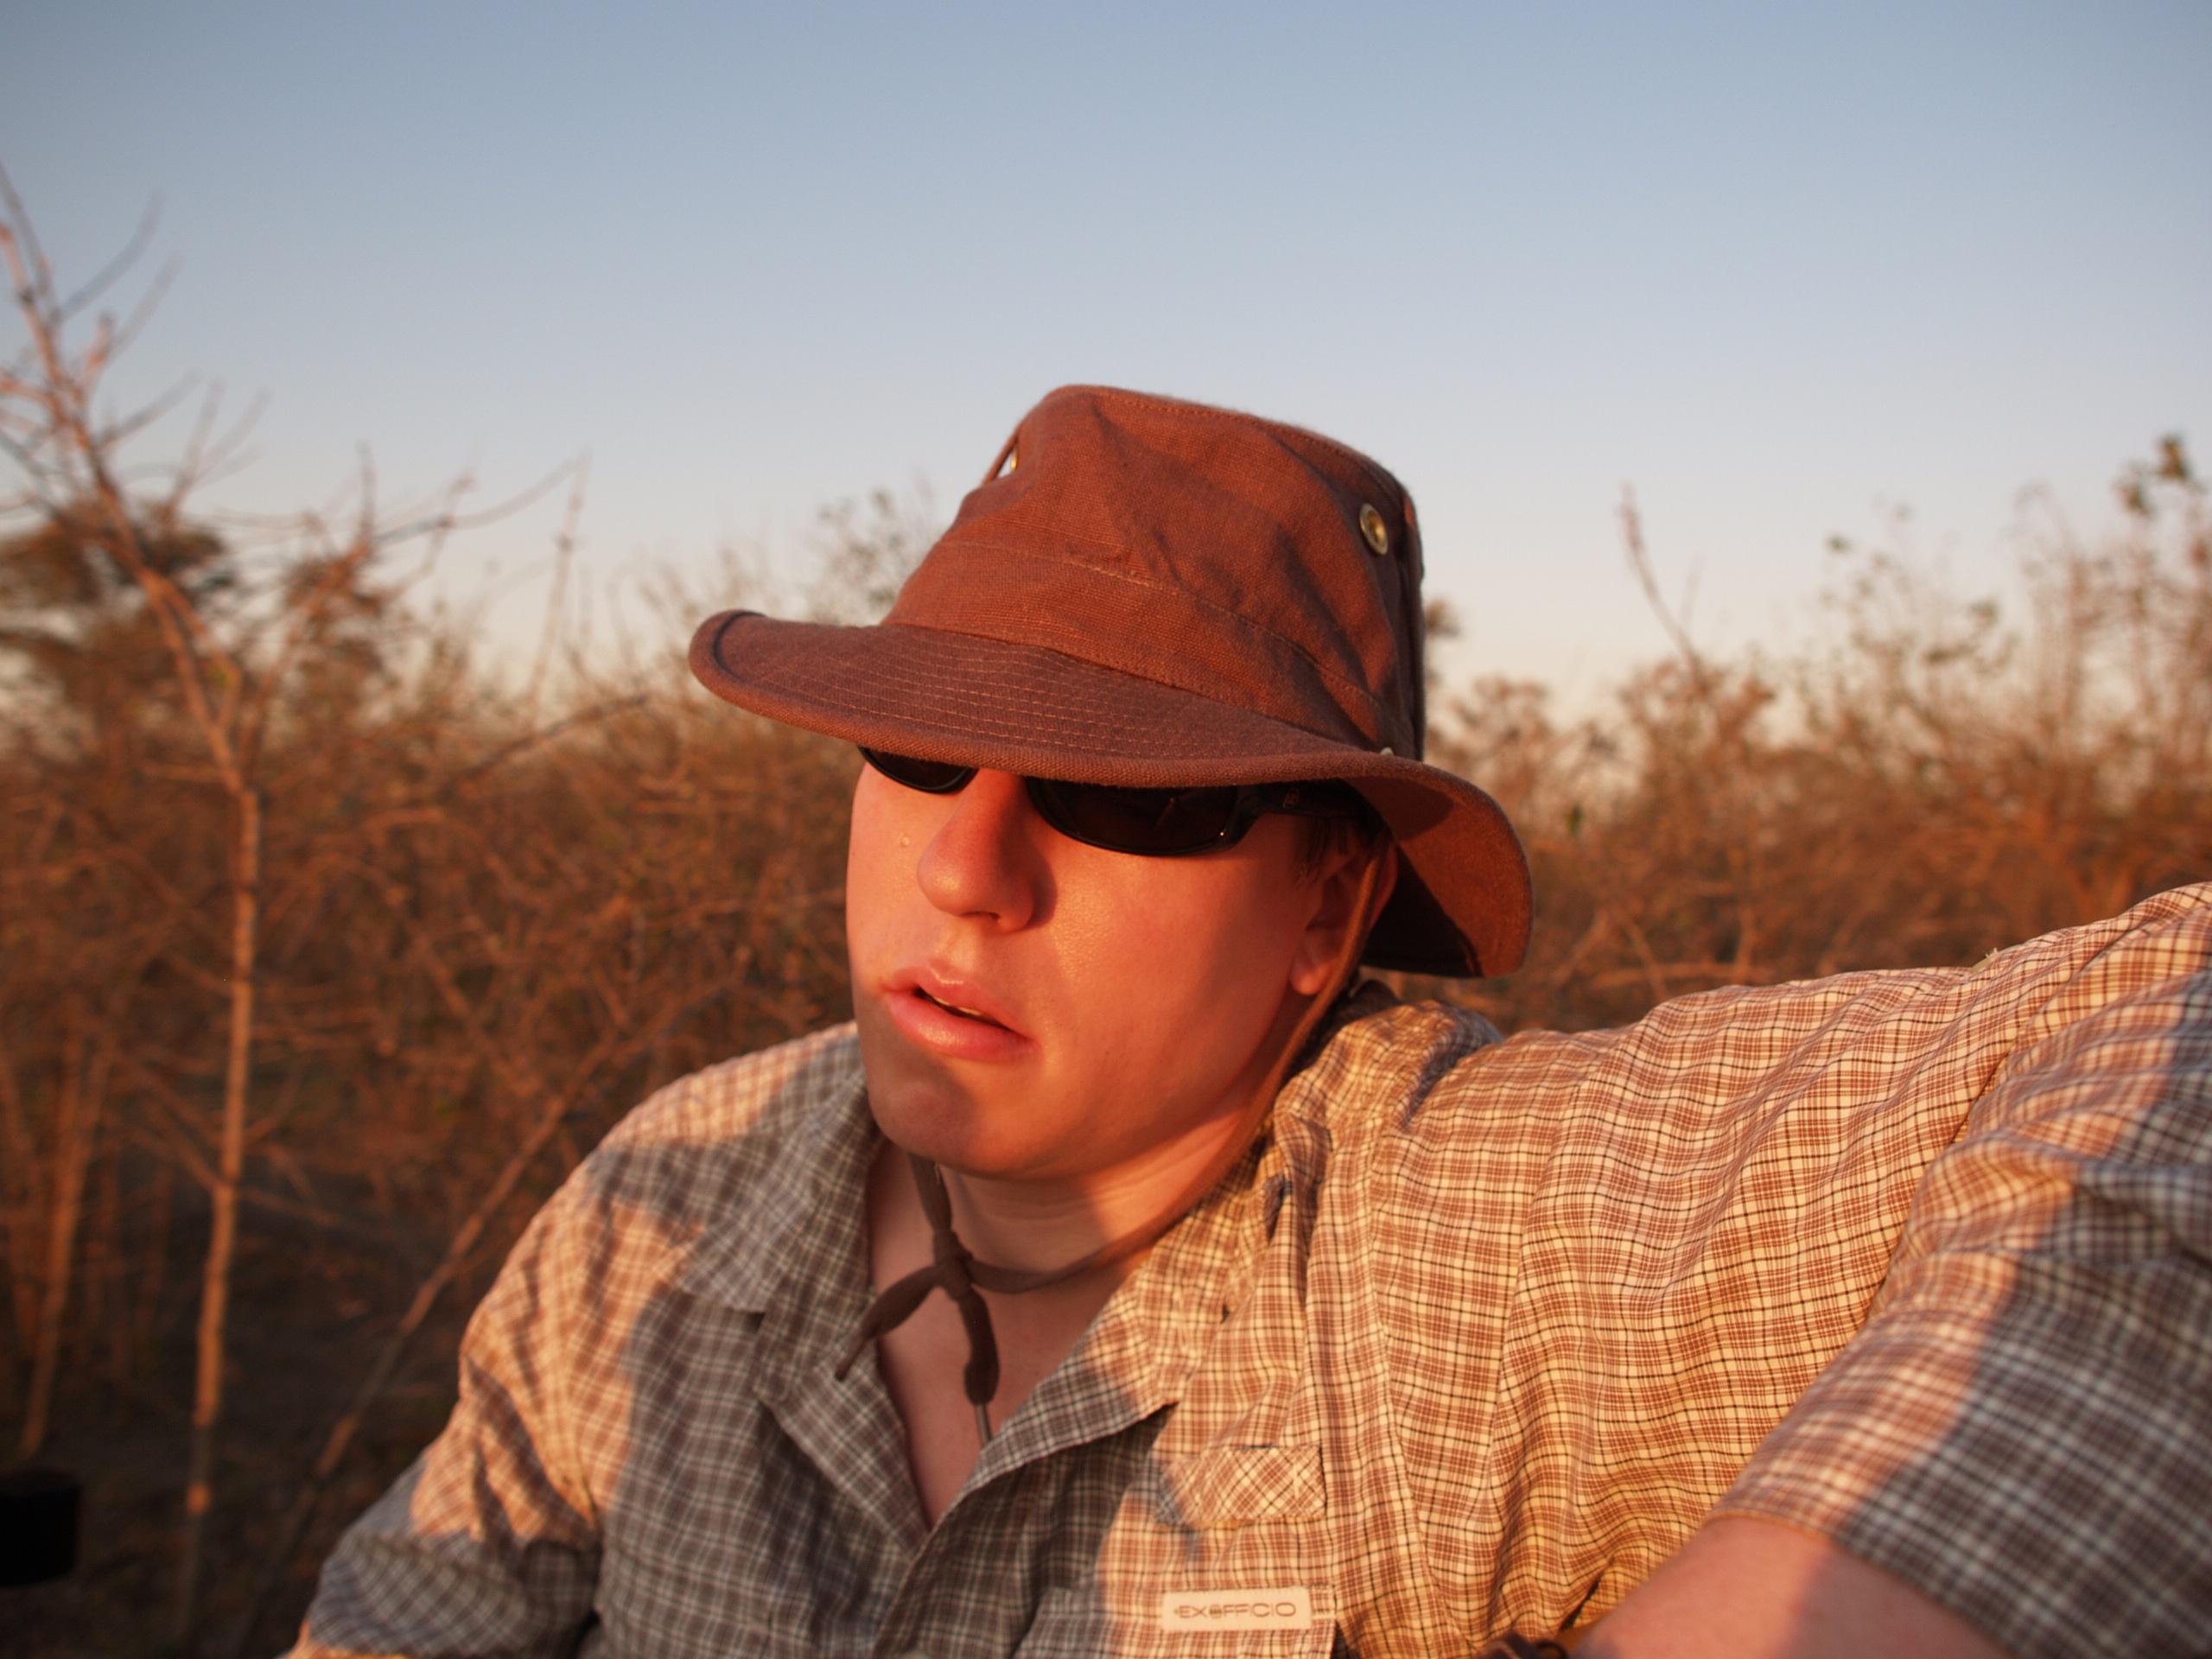 Kyle Hat Sunglasses Dylan